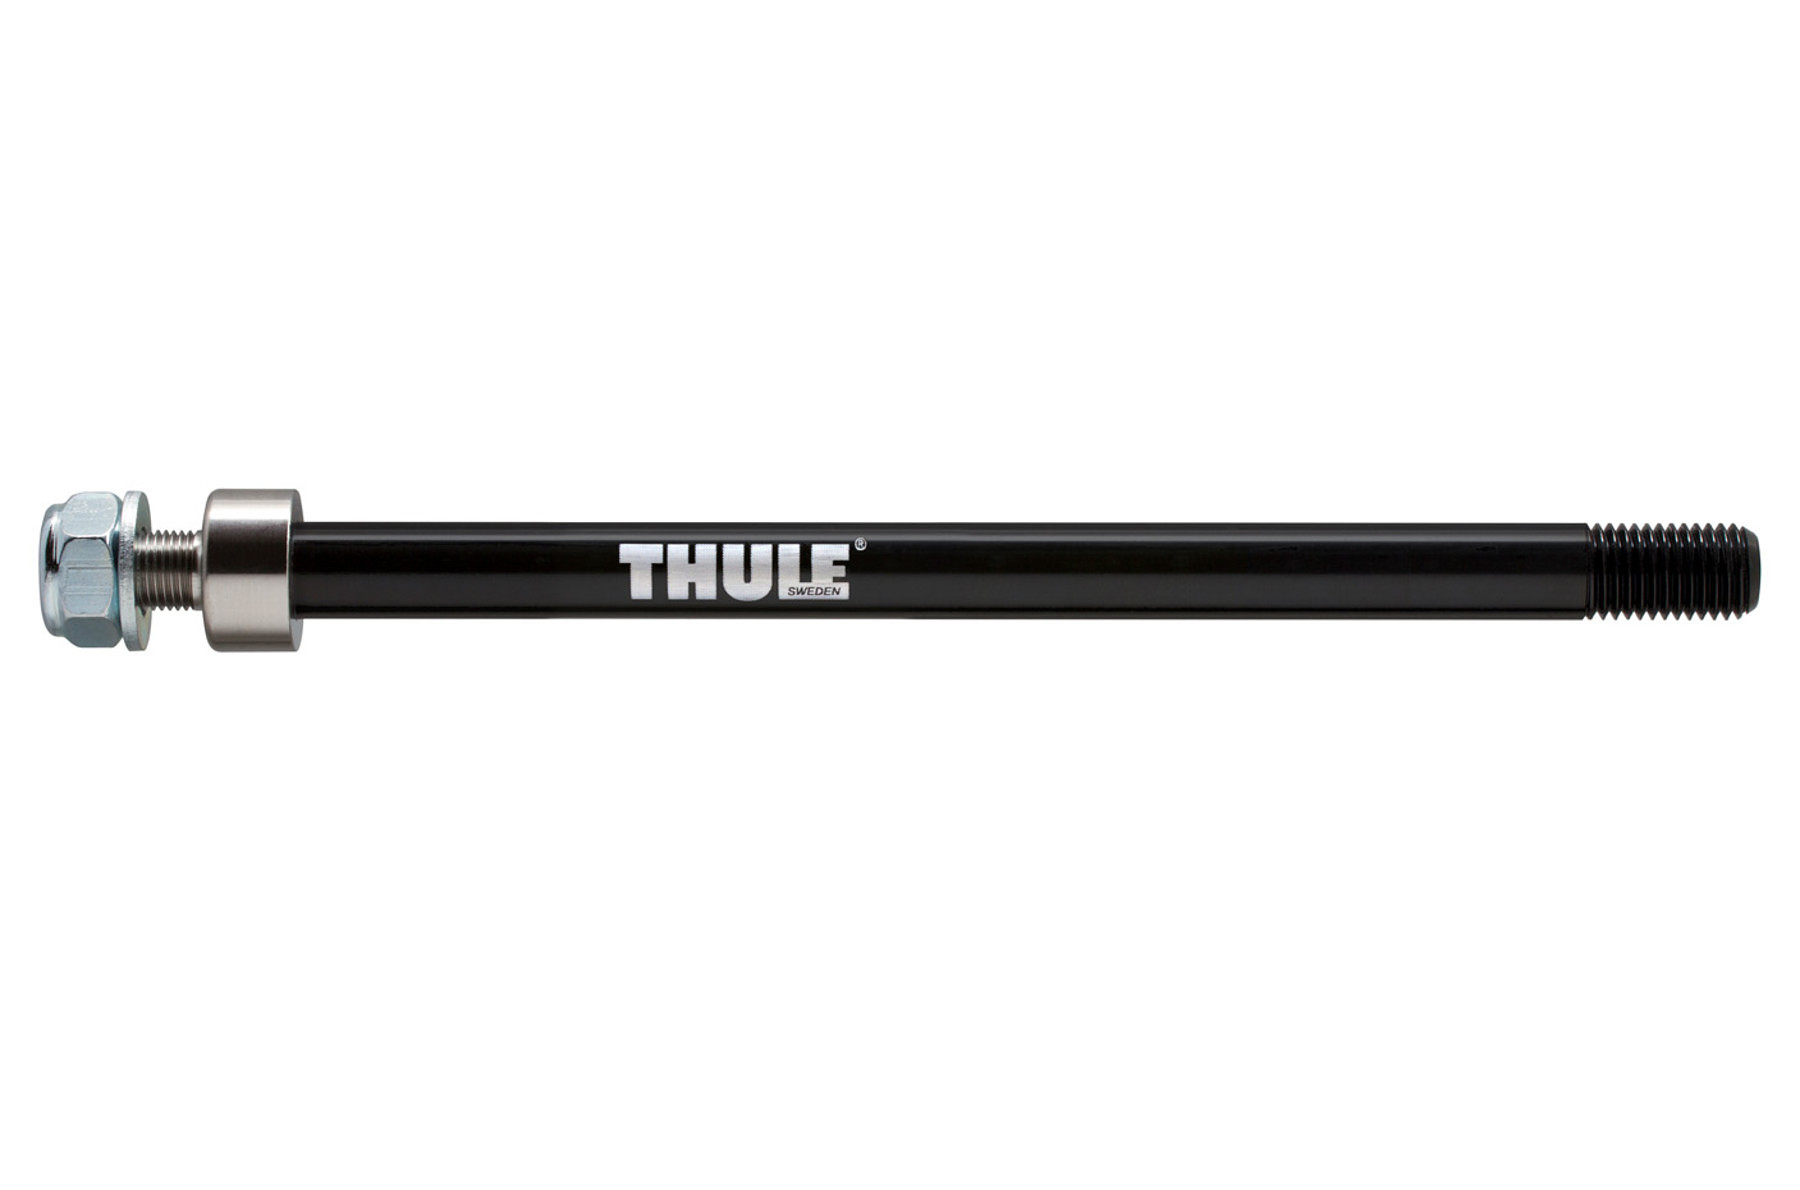 Thule Maxle Thru Axle 192 or 198 mm (M12X1.75)